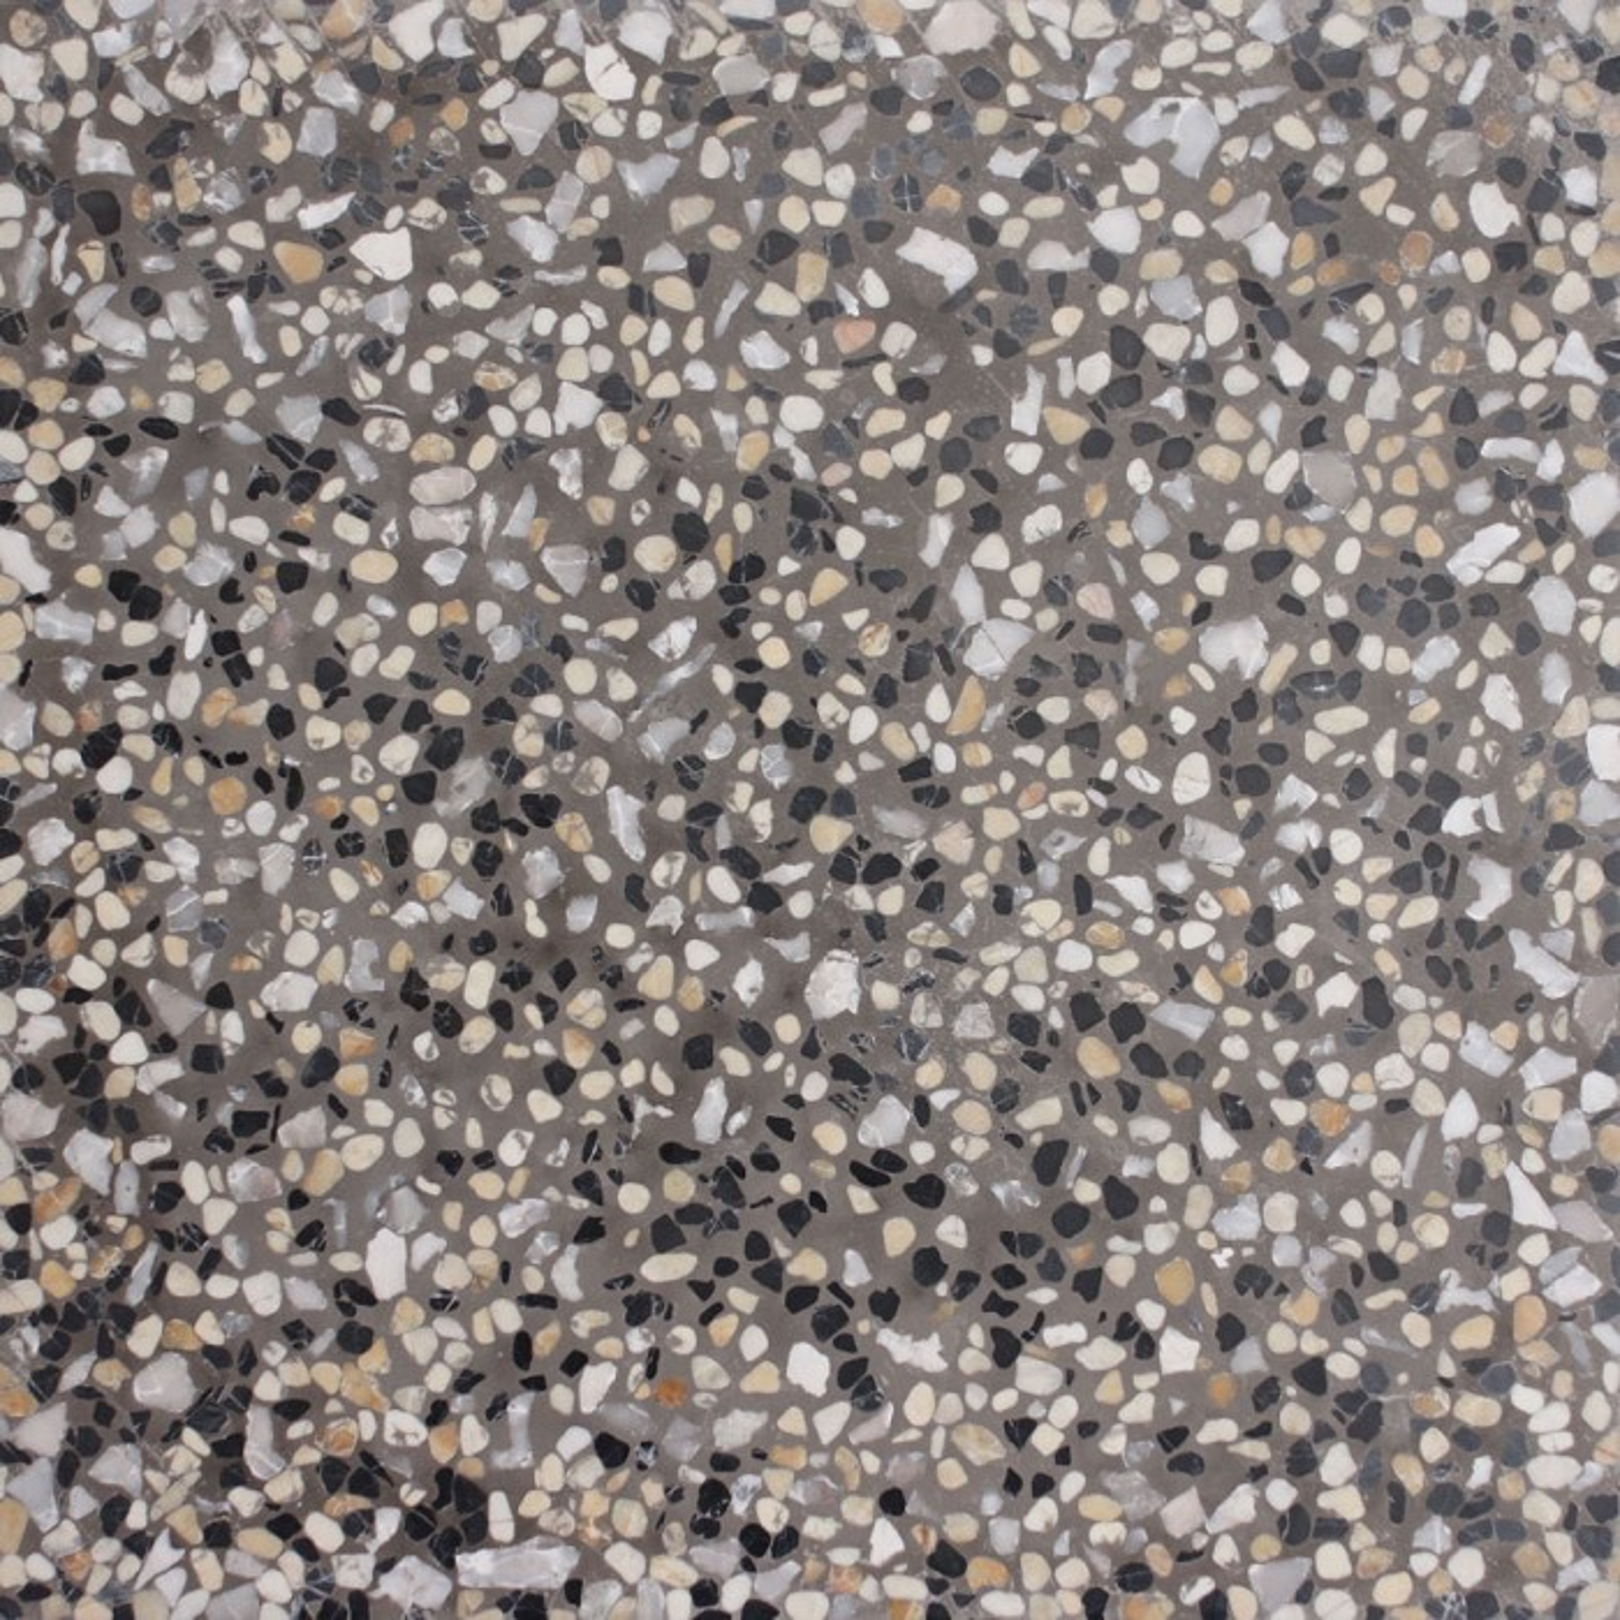 Carreau terrazzo uni gris moyen powo marbre 30x30cm for Carrelage terrazzo